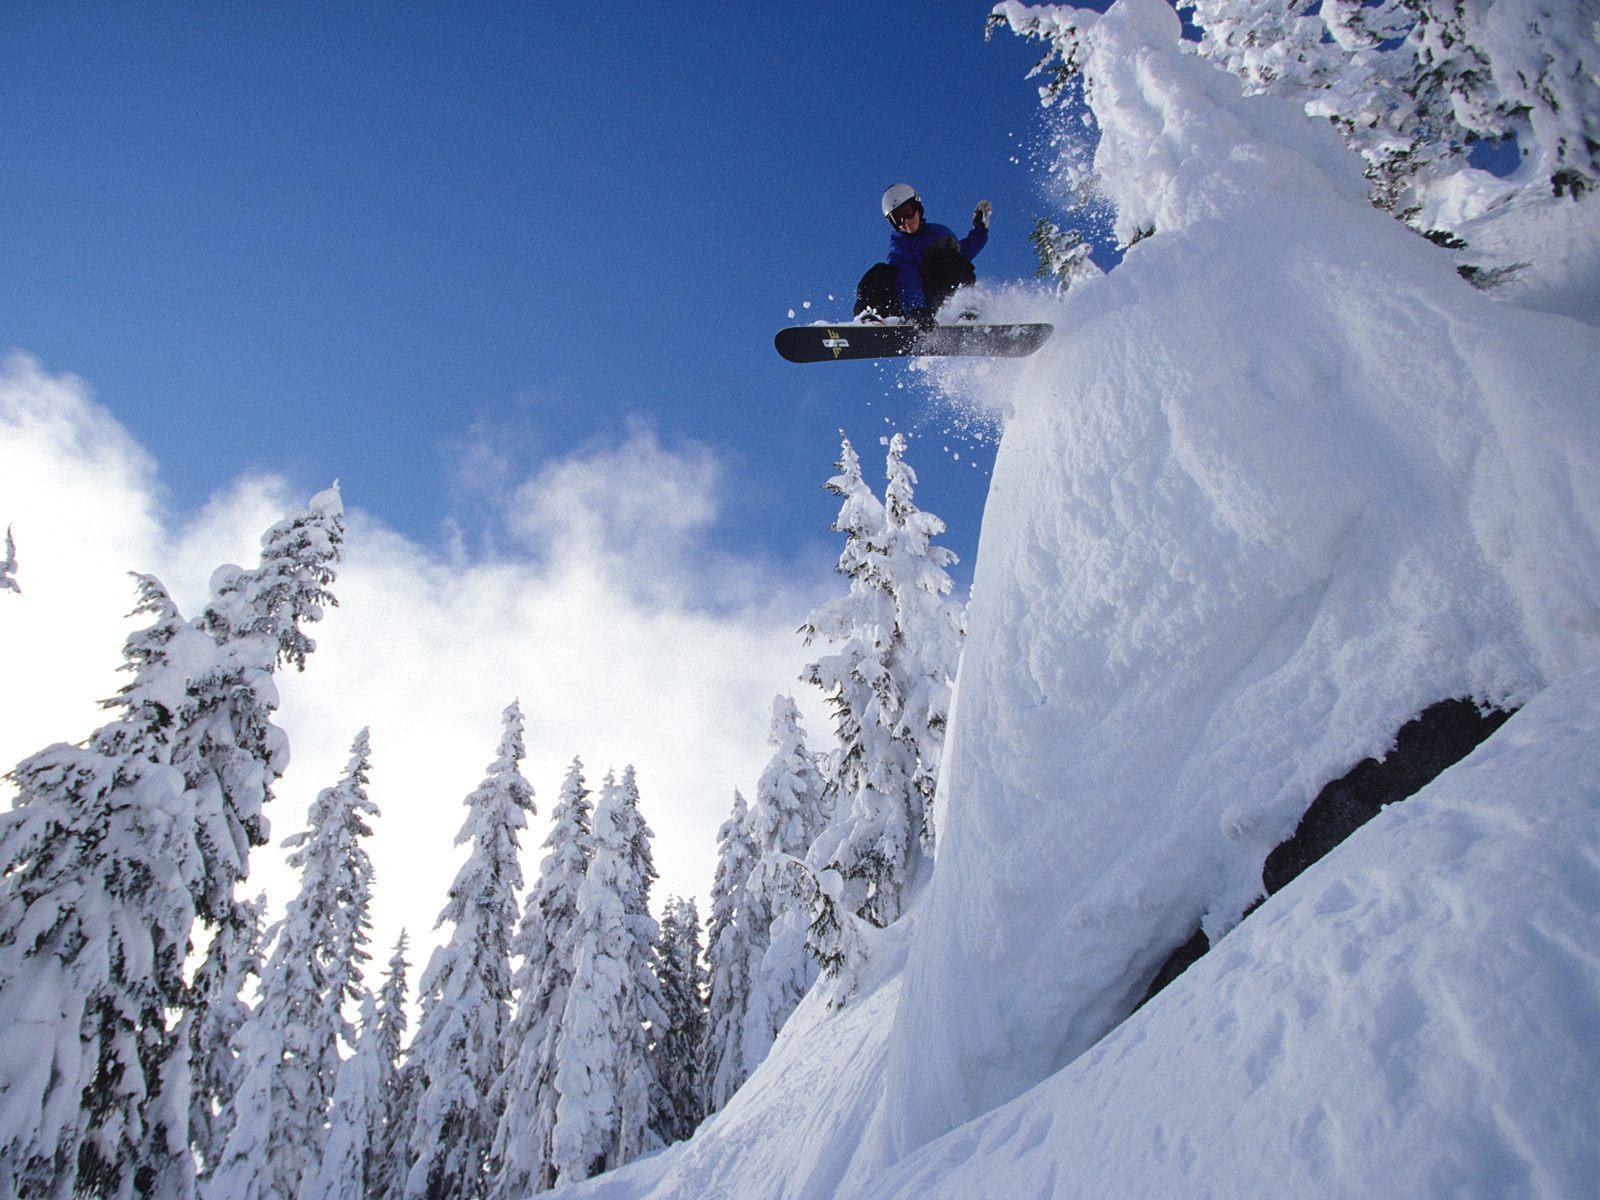 http://1.bp.blogspot.com/-X7bhrRvW72U/TtxIvANOmJI/AAAAAAAAAjs/_zQRuJqthkU/s1600/skiing-background-10-788861.jpg